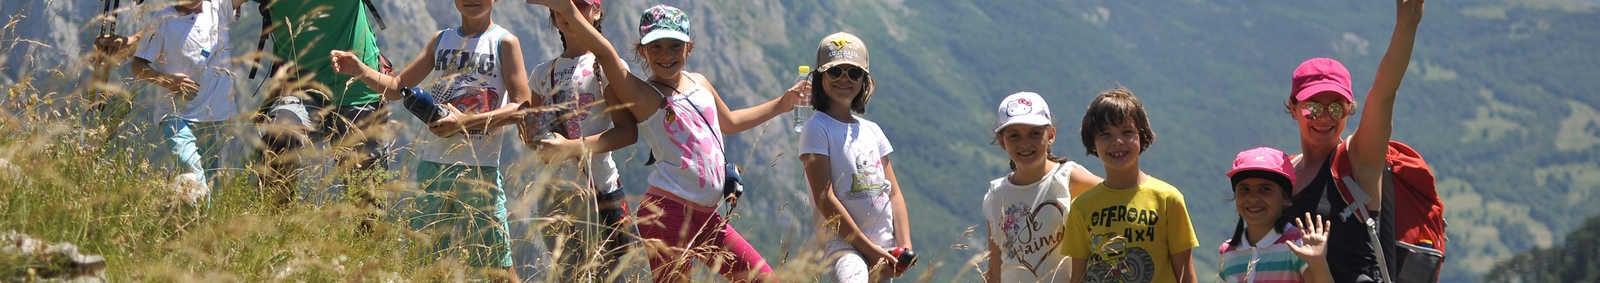 Children above Sutjeska Canyon